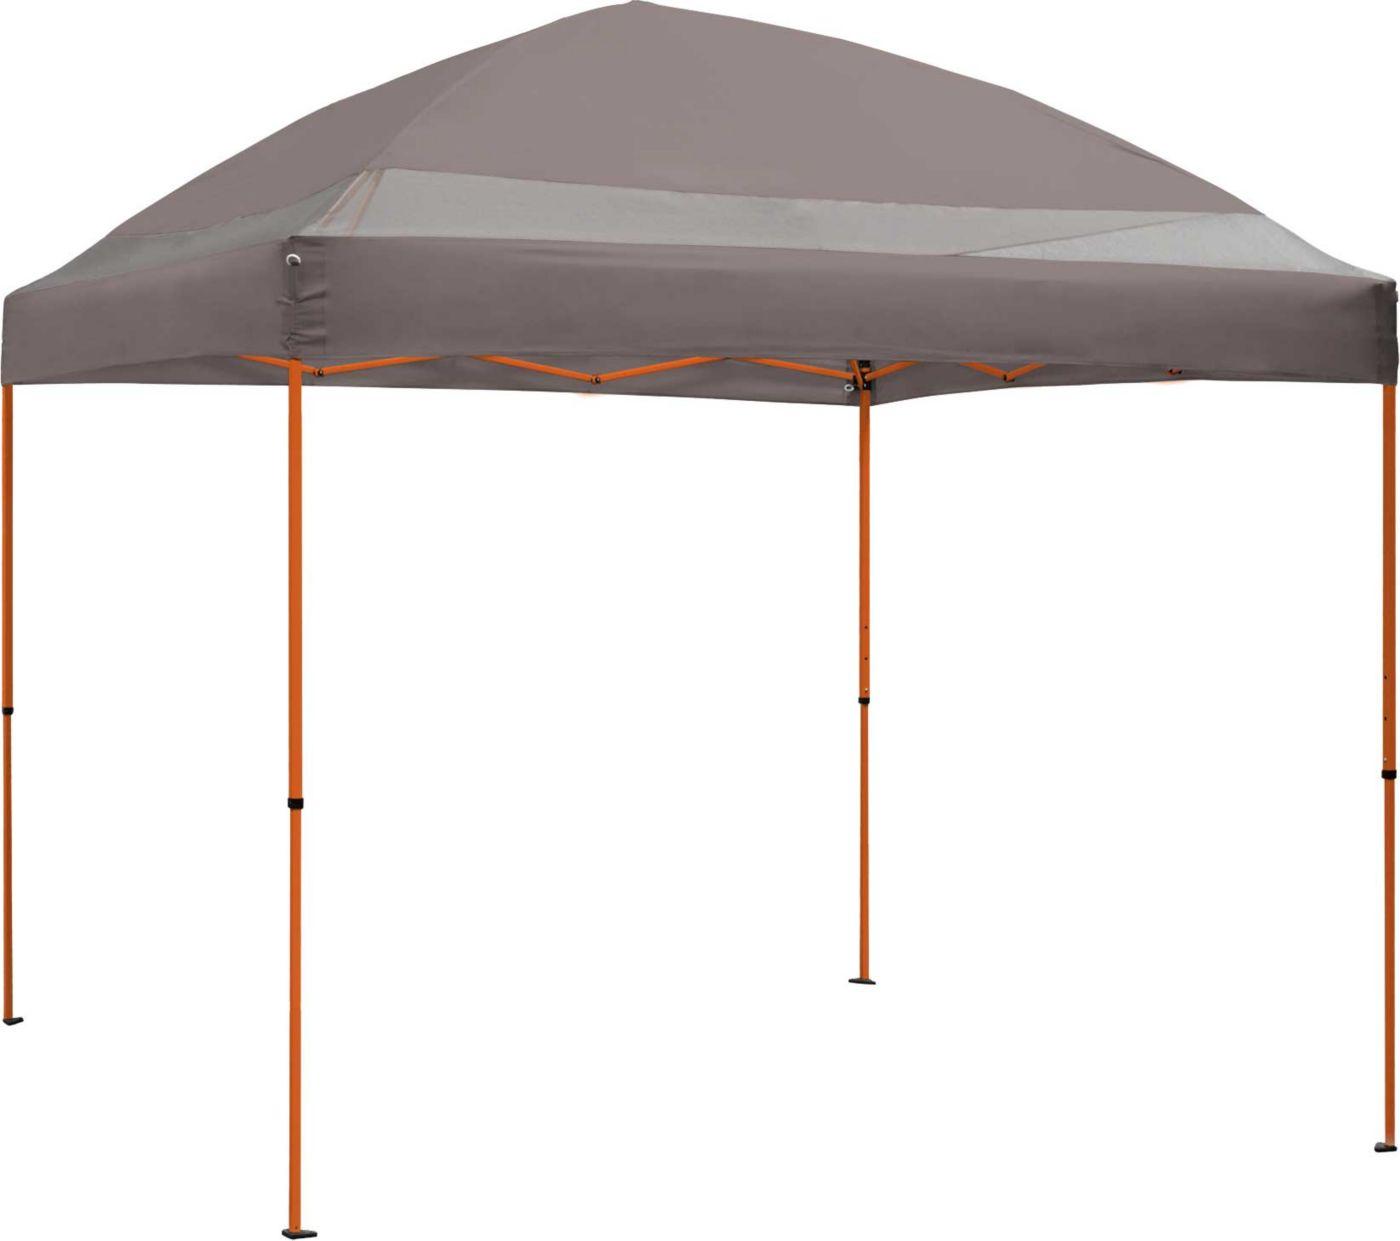 Caravan Canopy 10' x 10' ArchBreeze Instant Canopy